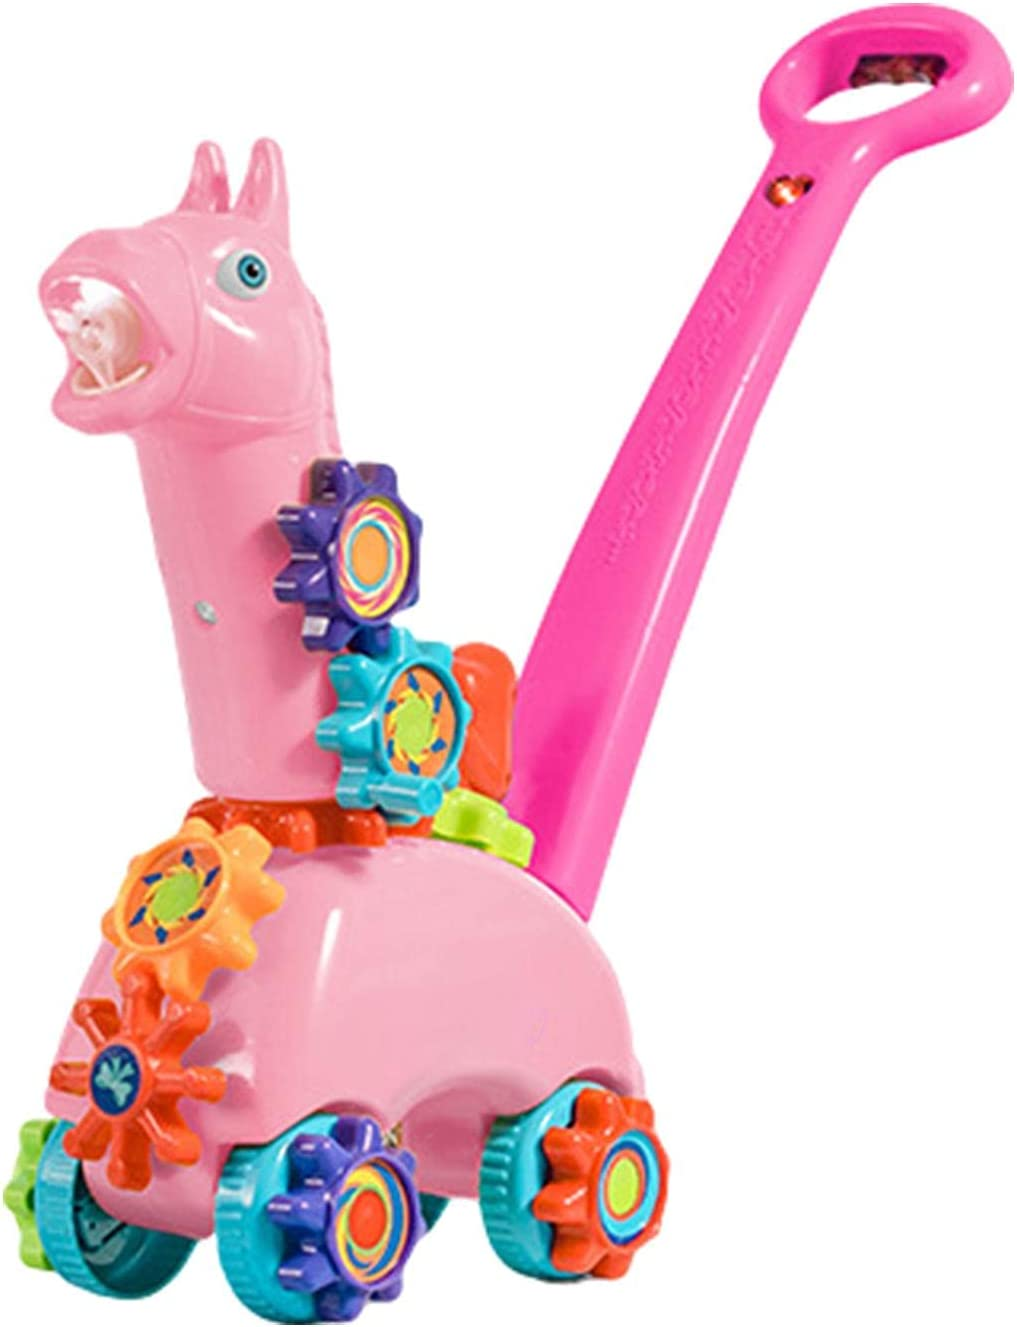 Trolley Children's Giraffe Electric Bubble Machine, Automatic Bu